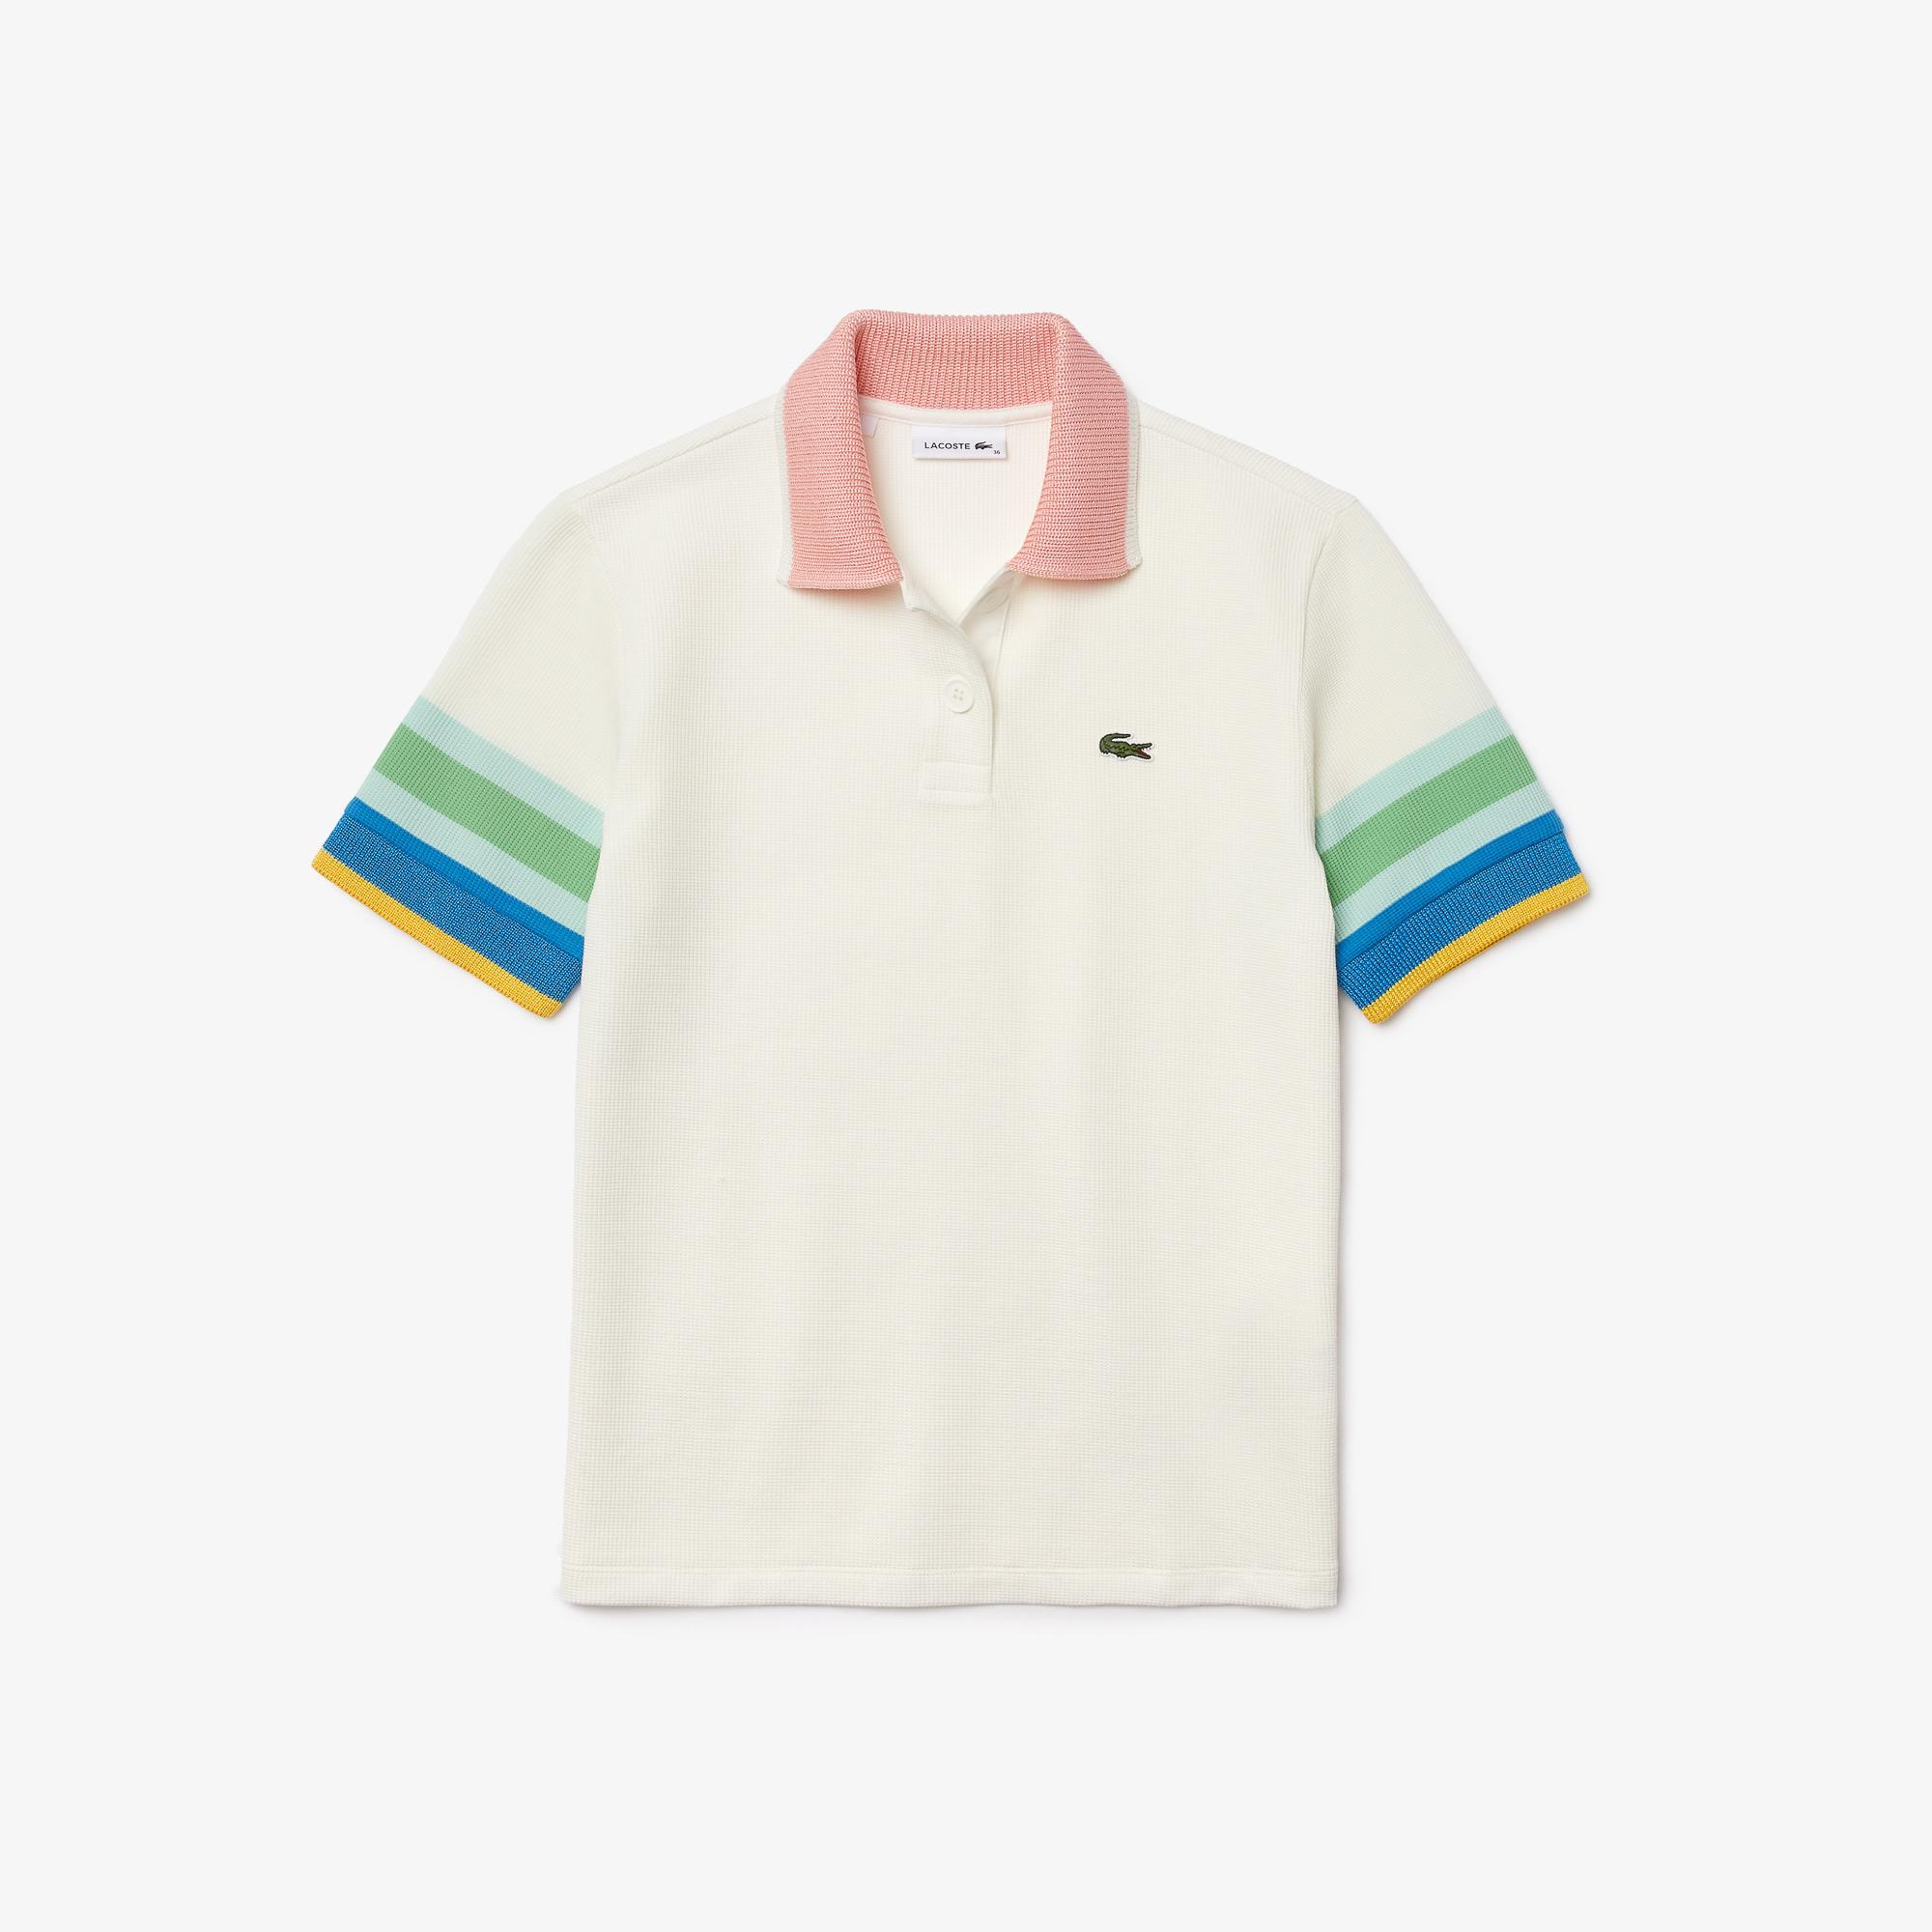 Lacoste Damska koszulka polo z paskami na rękawach z bawełny strukturalnej